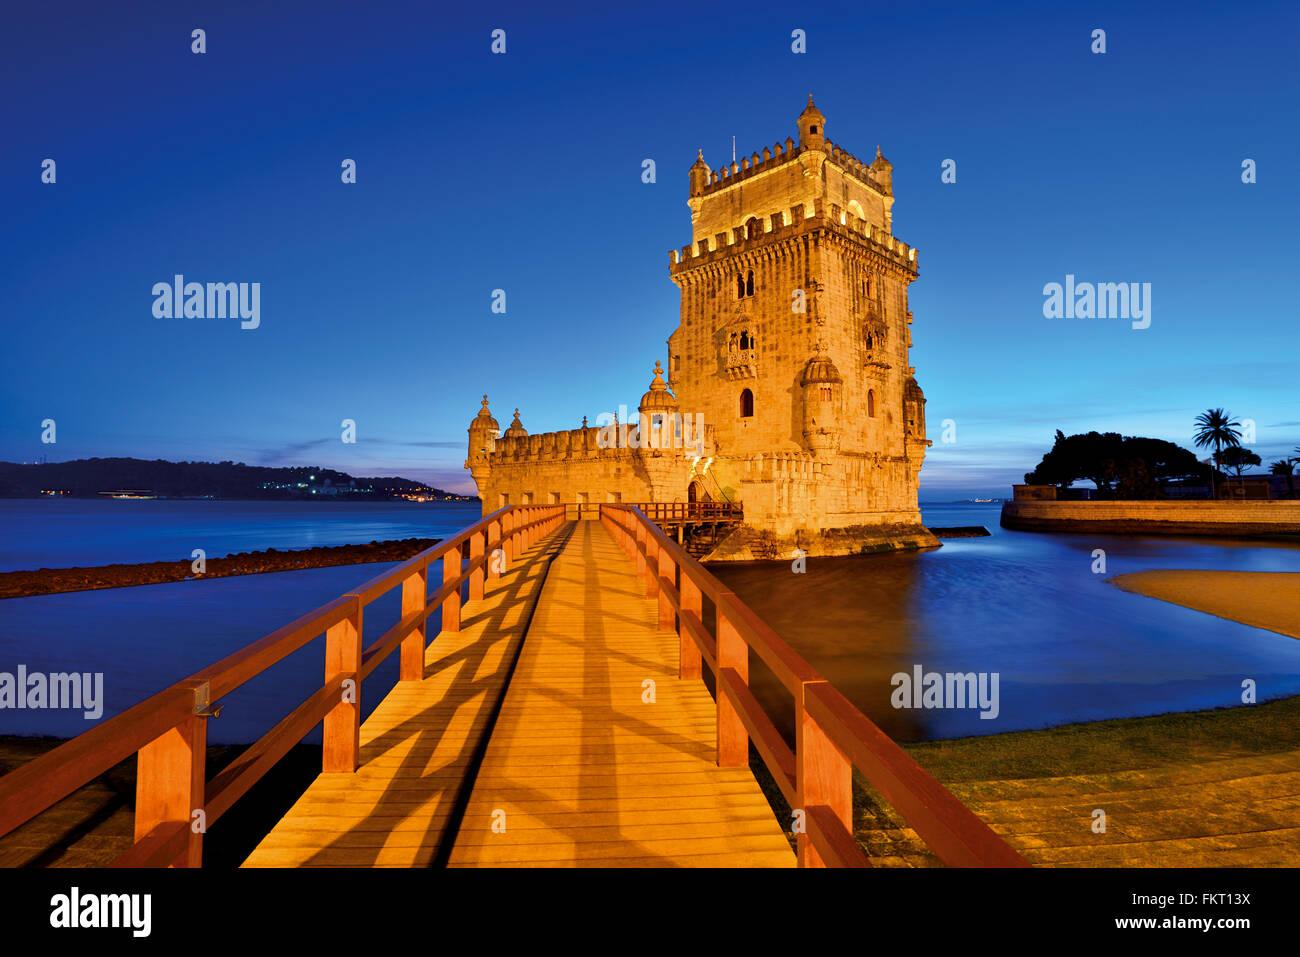 Portugal, Lisboa: Torre Monumental de Belém por noche Foto de stock